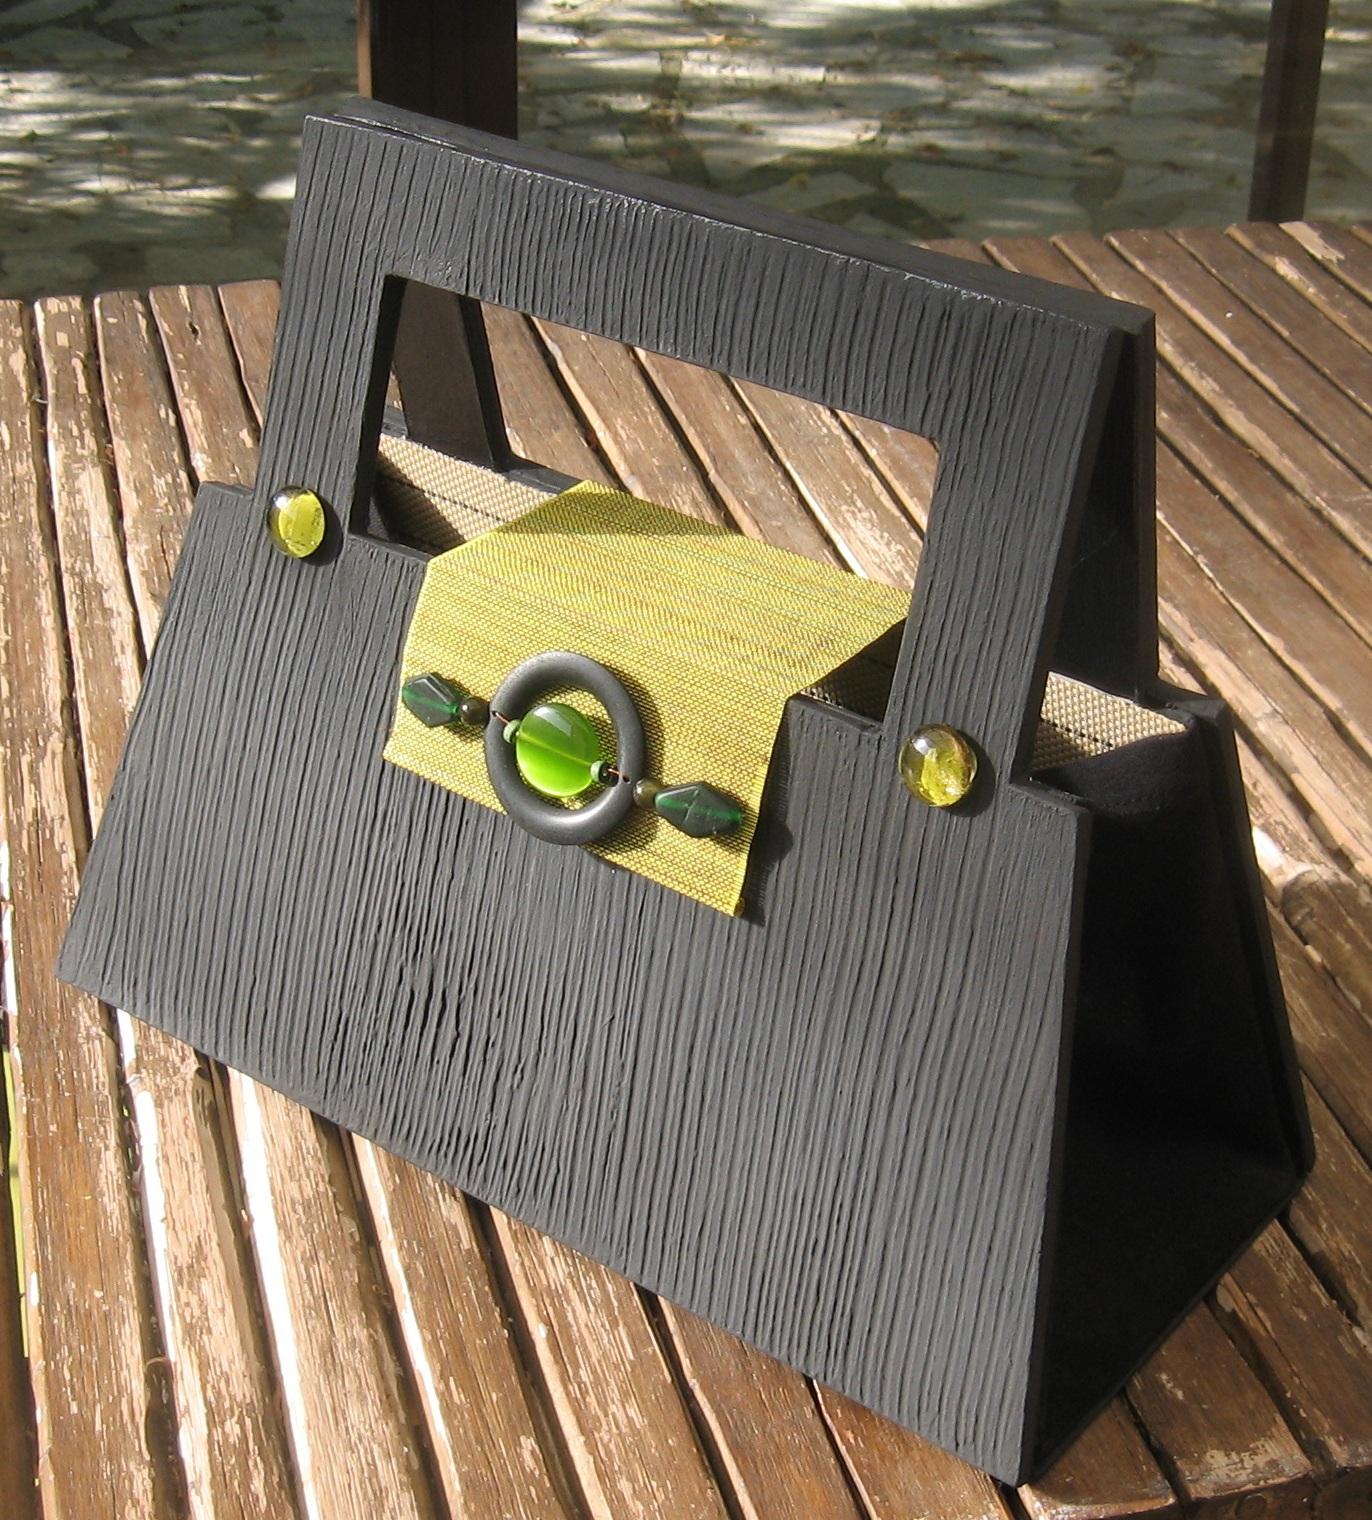 la fabrication de meuble en carton par mariekrtonne cartonrecup. Black Bedroom Furniture Sets. Home Design Ideas